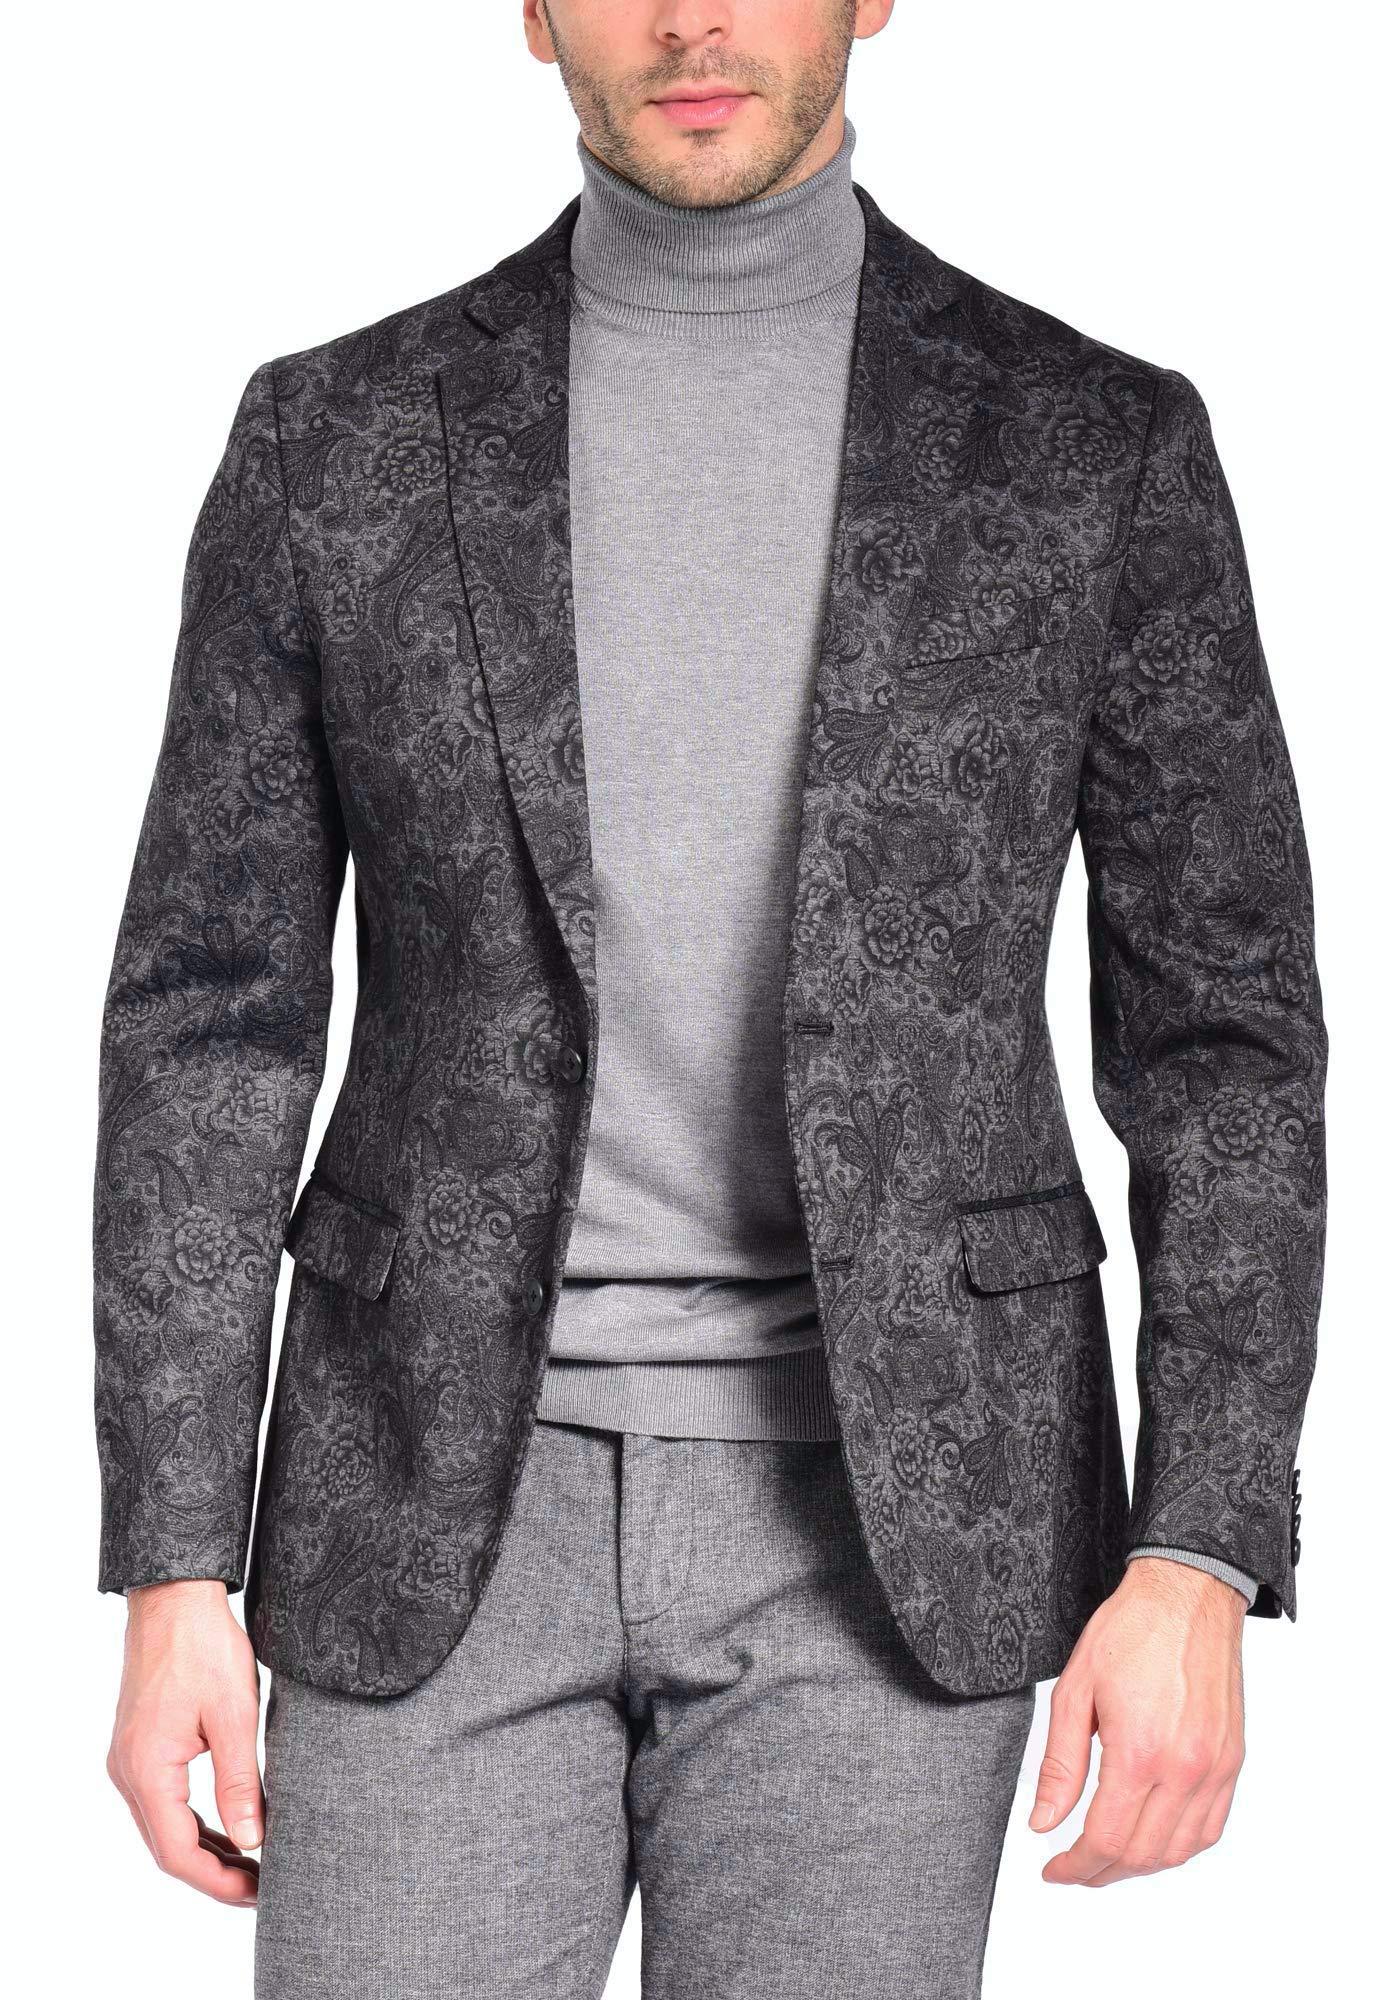 Craft & Soul Men's Slim Modern Fit Stretch Tailored Pattern Knit Blazer Jacket Sport Coat